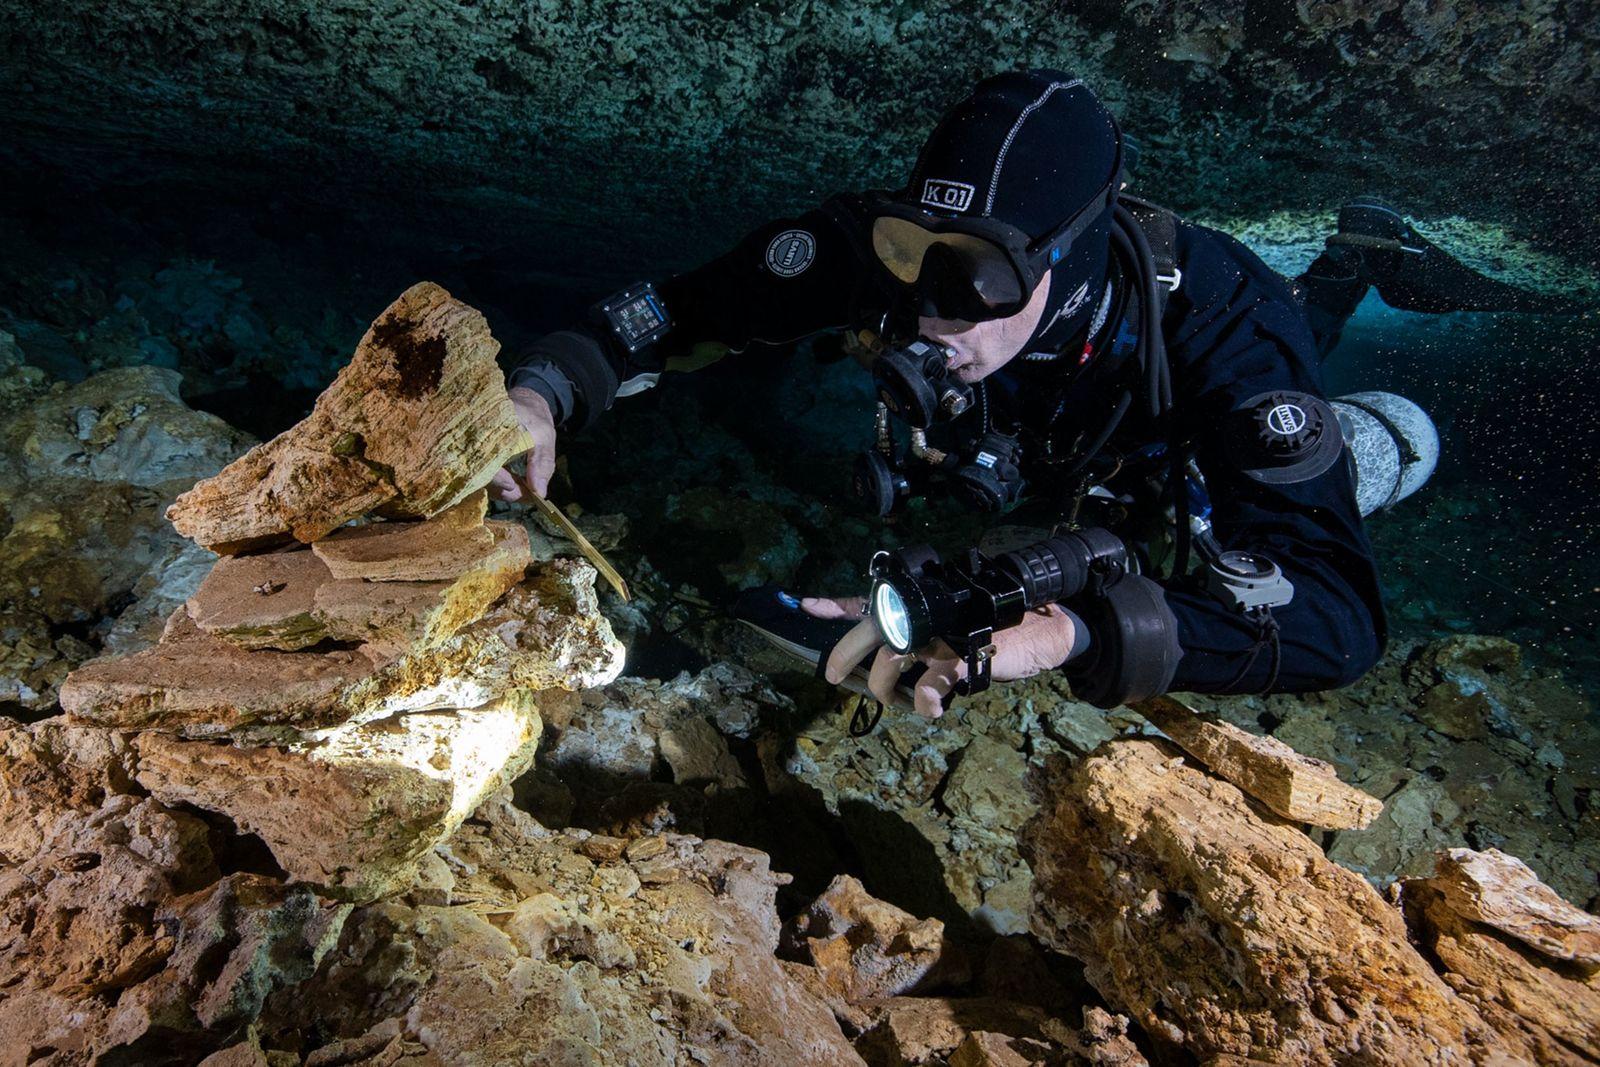 Mina de 11 mil anos no interior de caverna submersa surpreende arqueólogos no México